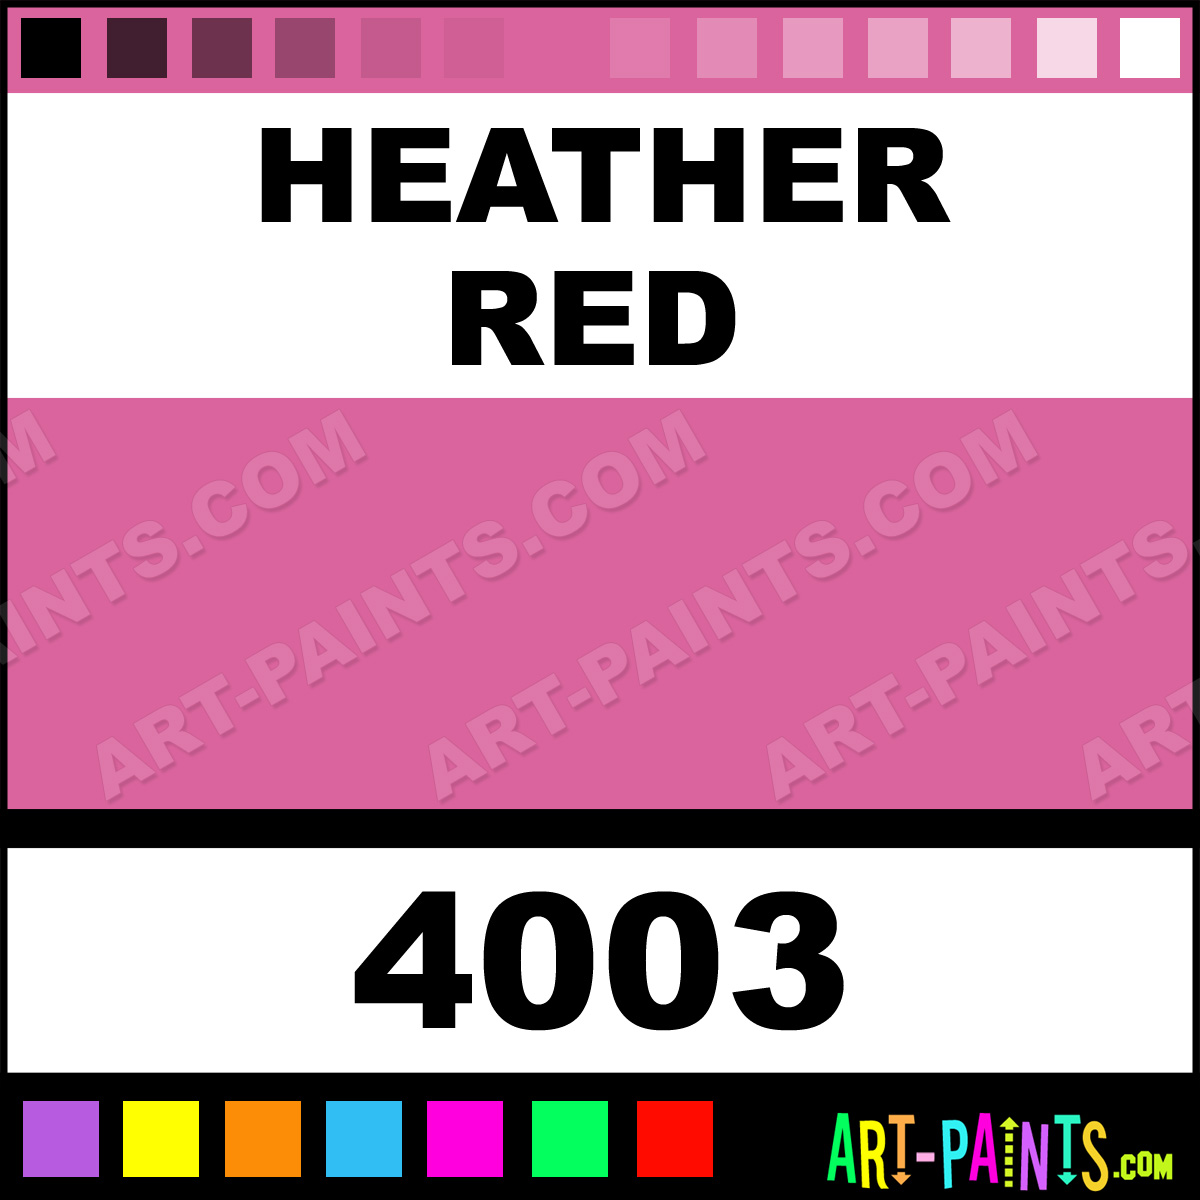 Testors Spray Paint Colors Testors Enamel Spray Paint Colors Testors